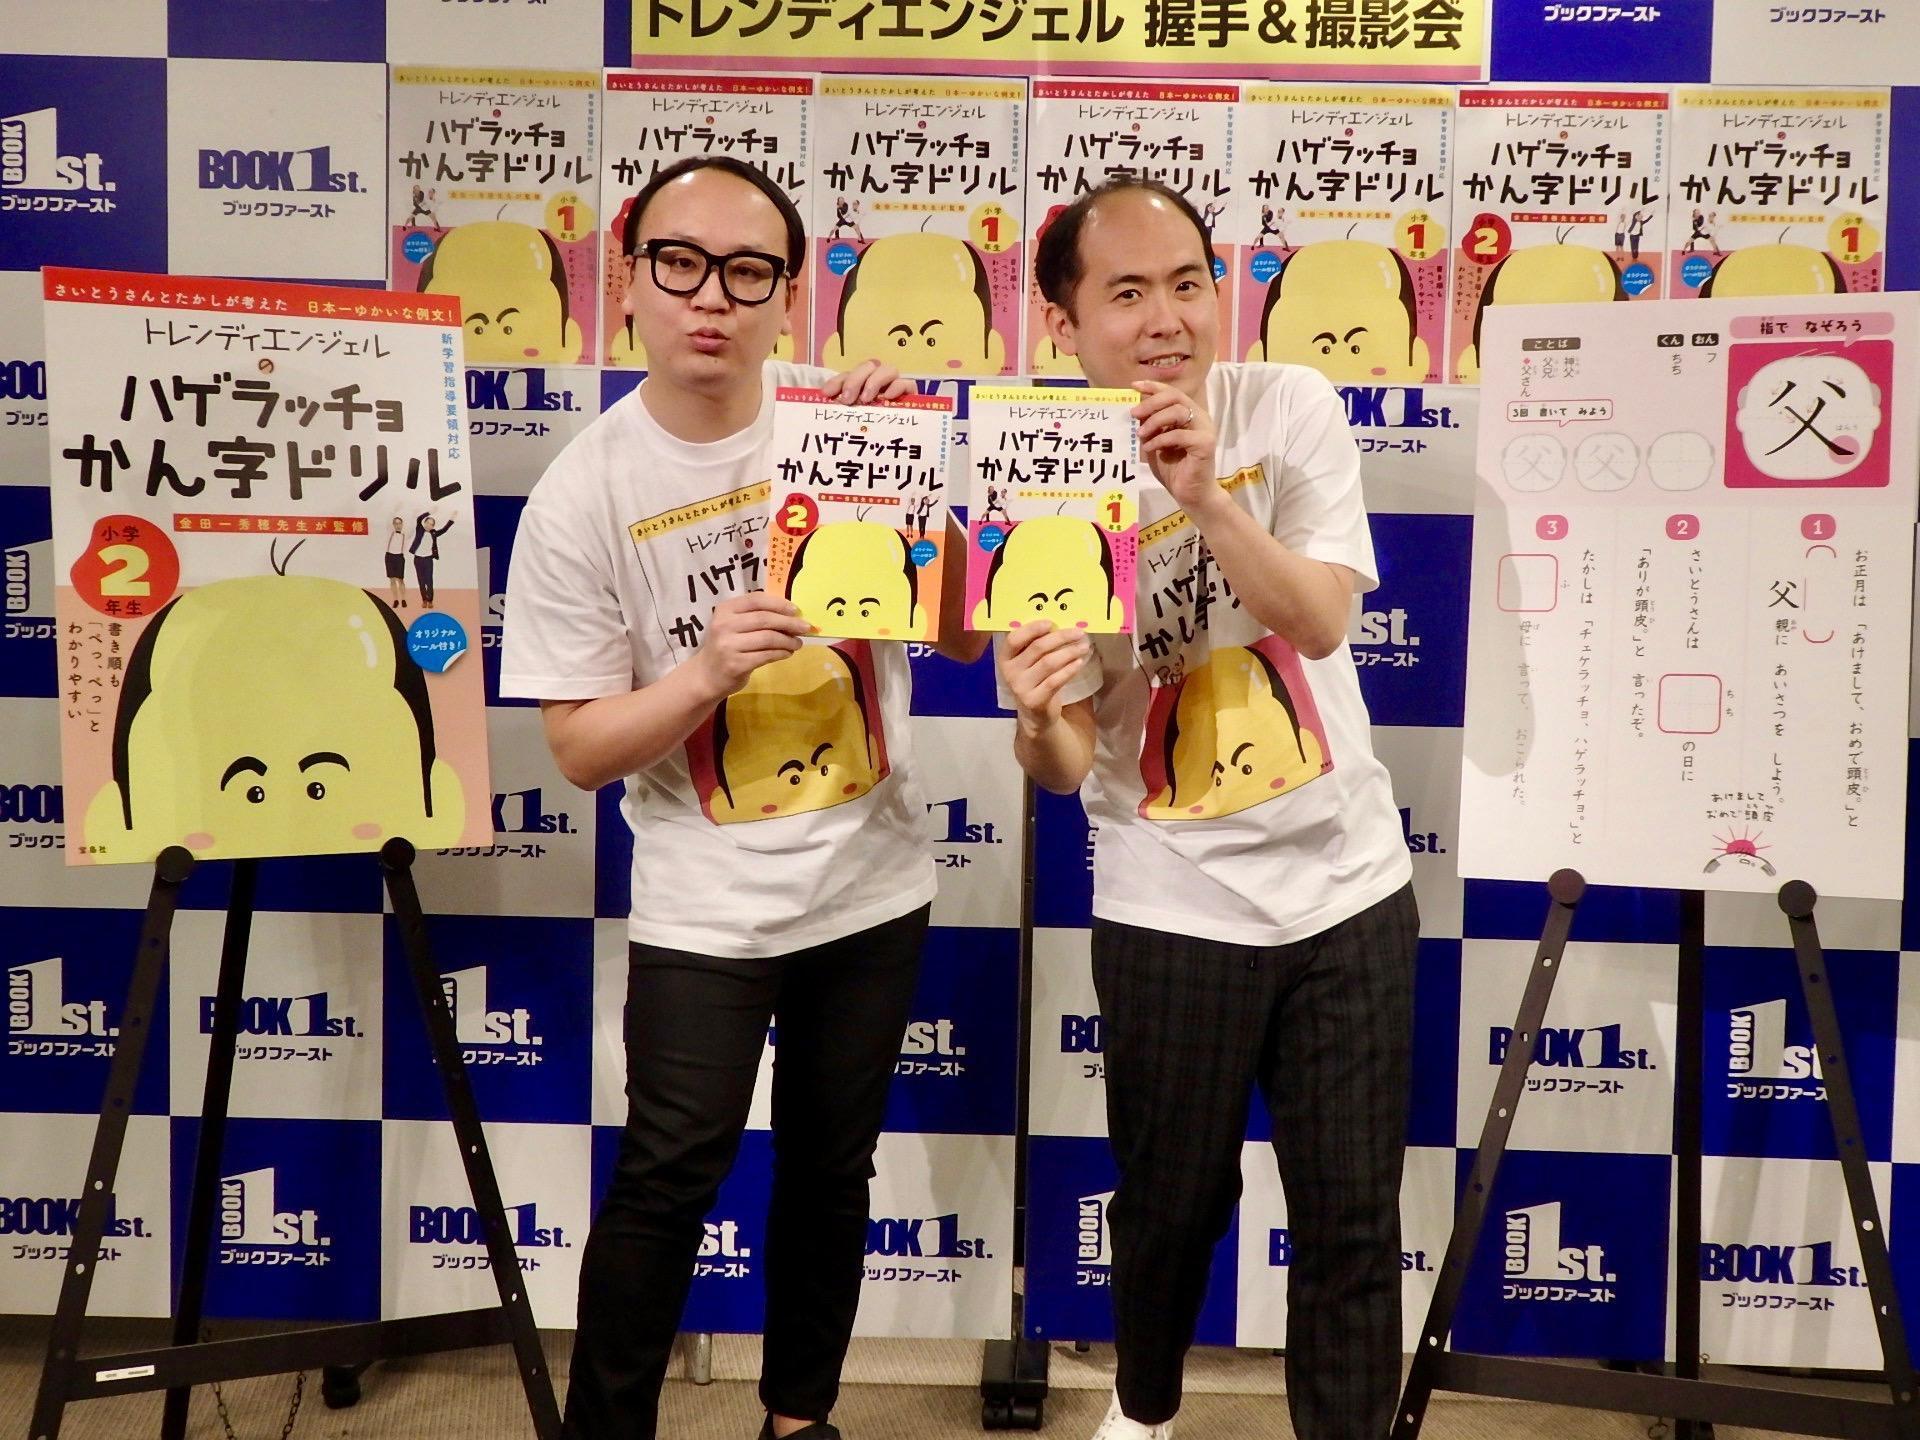 http://news.yoshimoto.co.jp/20180411235627-0df8f3ca44b73ca506eada22b9c7ac5b6c538322.jpg